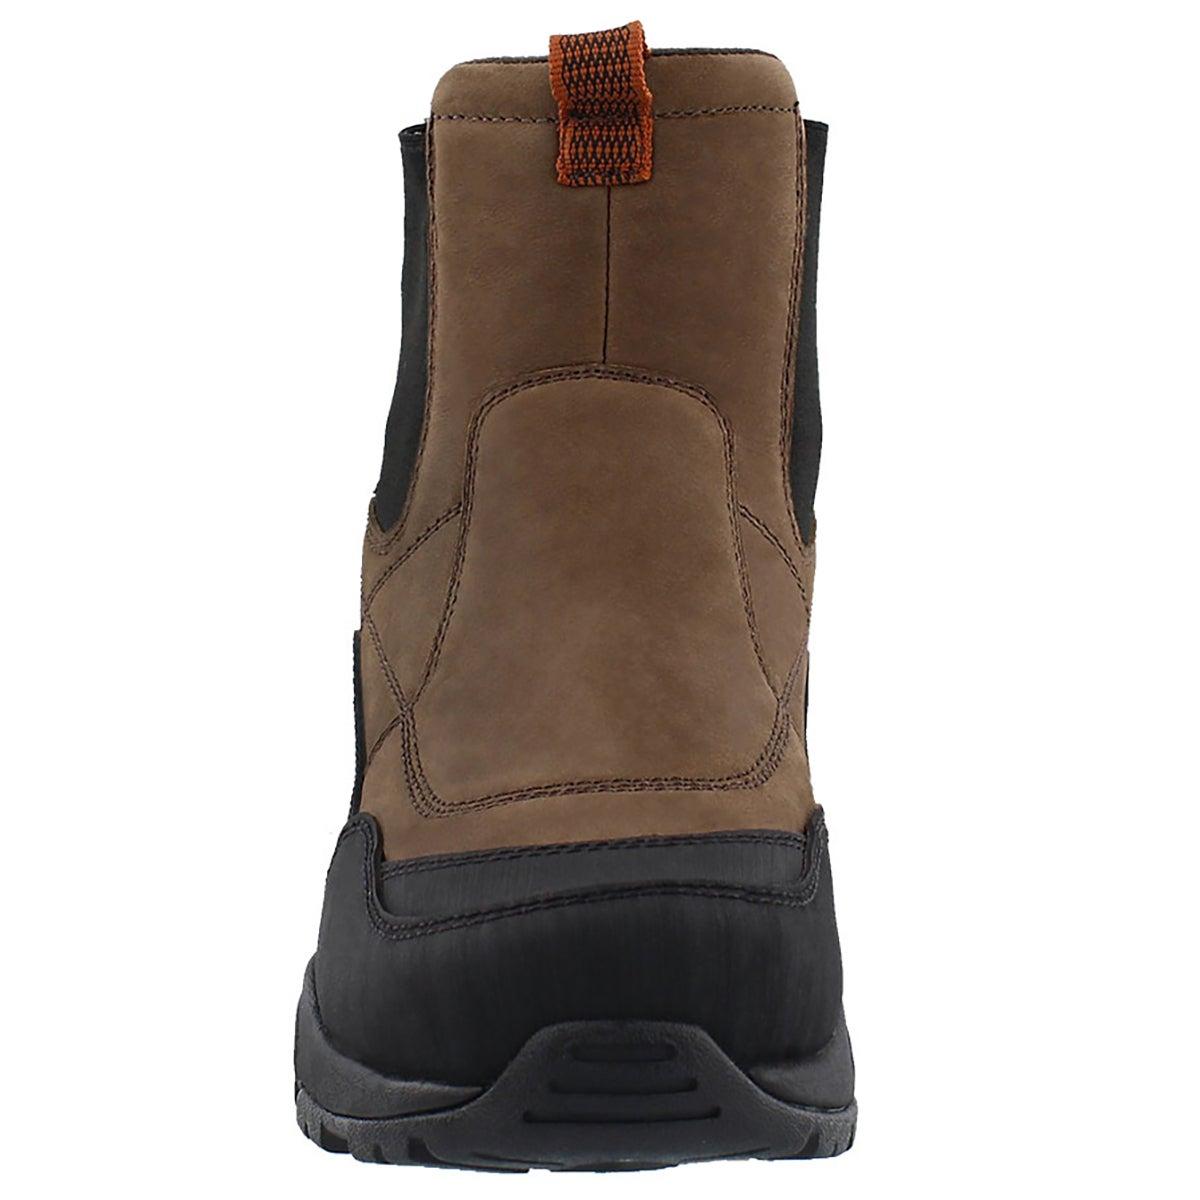 Mns Mason brown wtpf winter boot